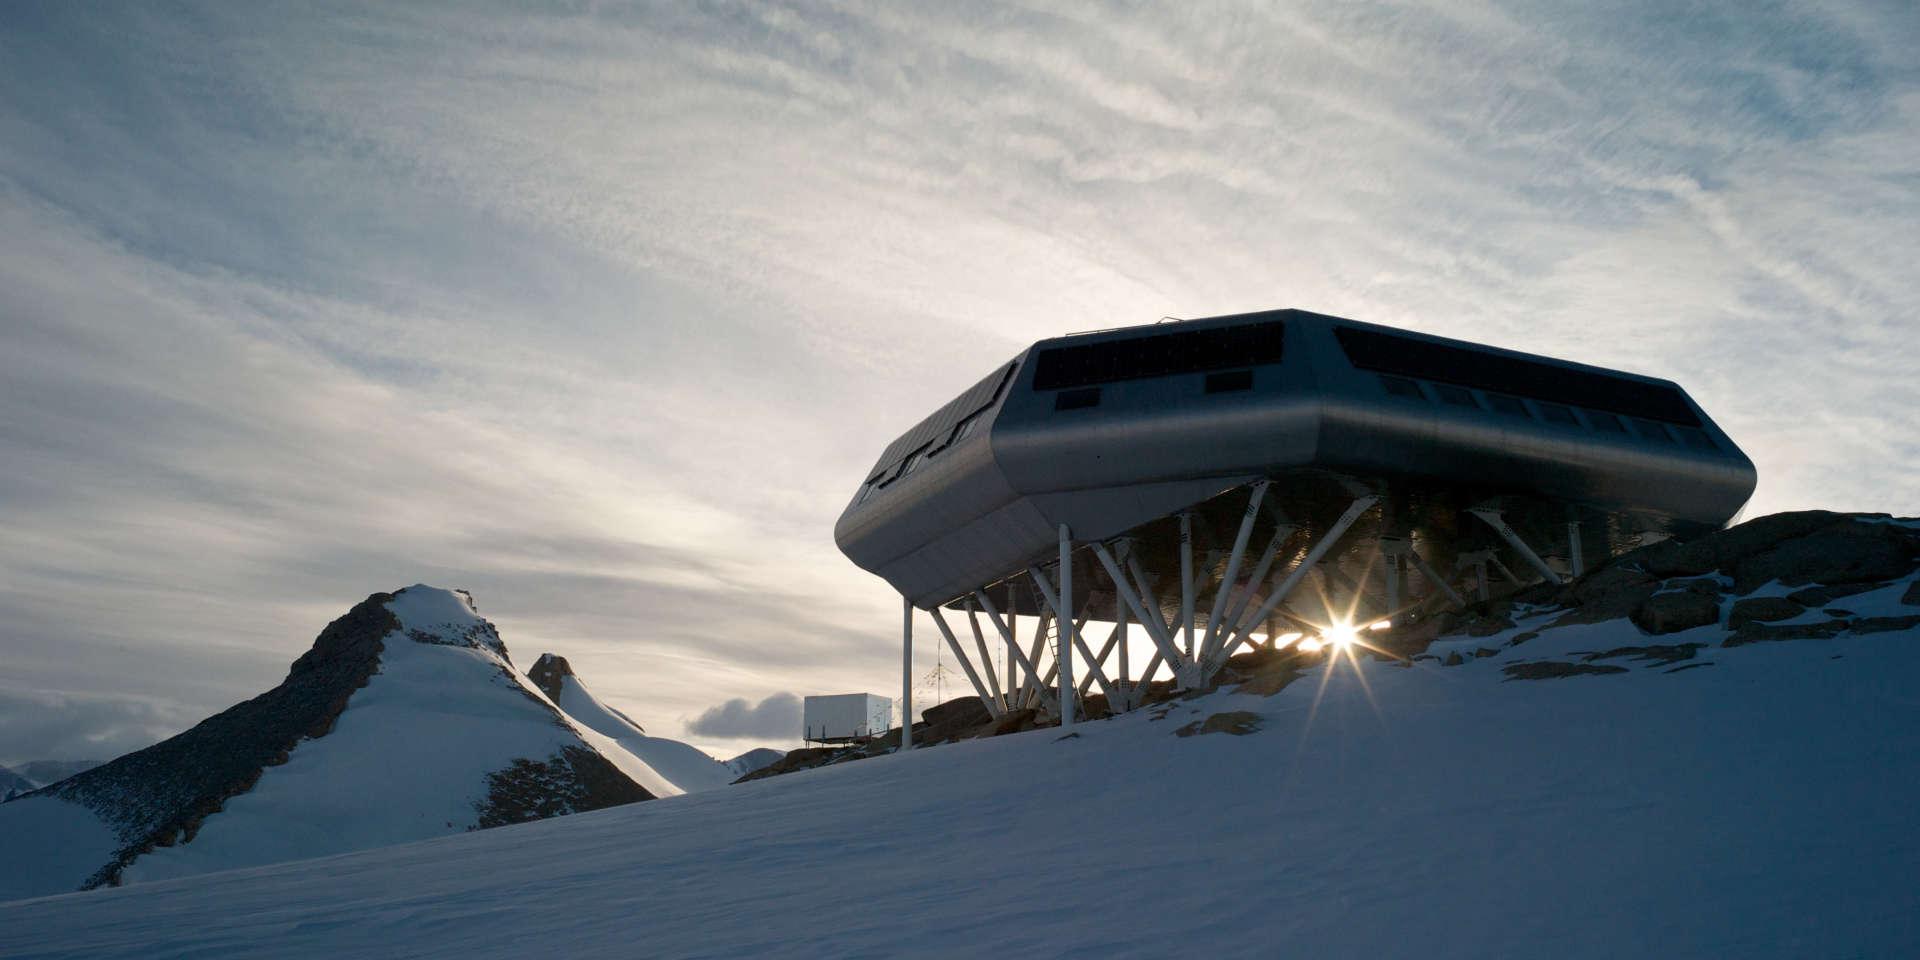 La station Princess-Elisabeth-Antarctica, de la Fondation polaire internationale.